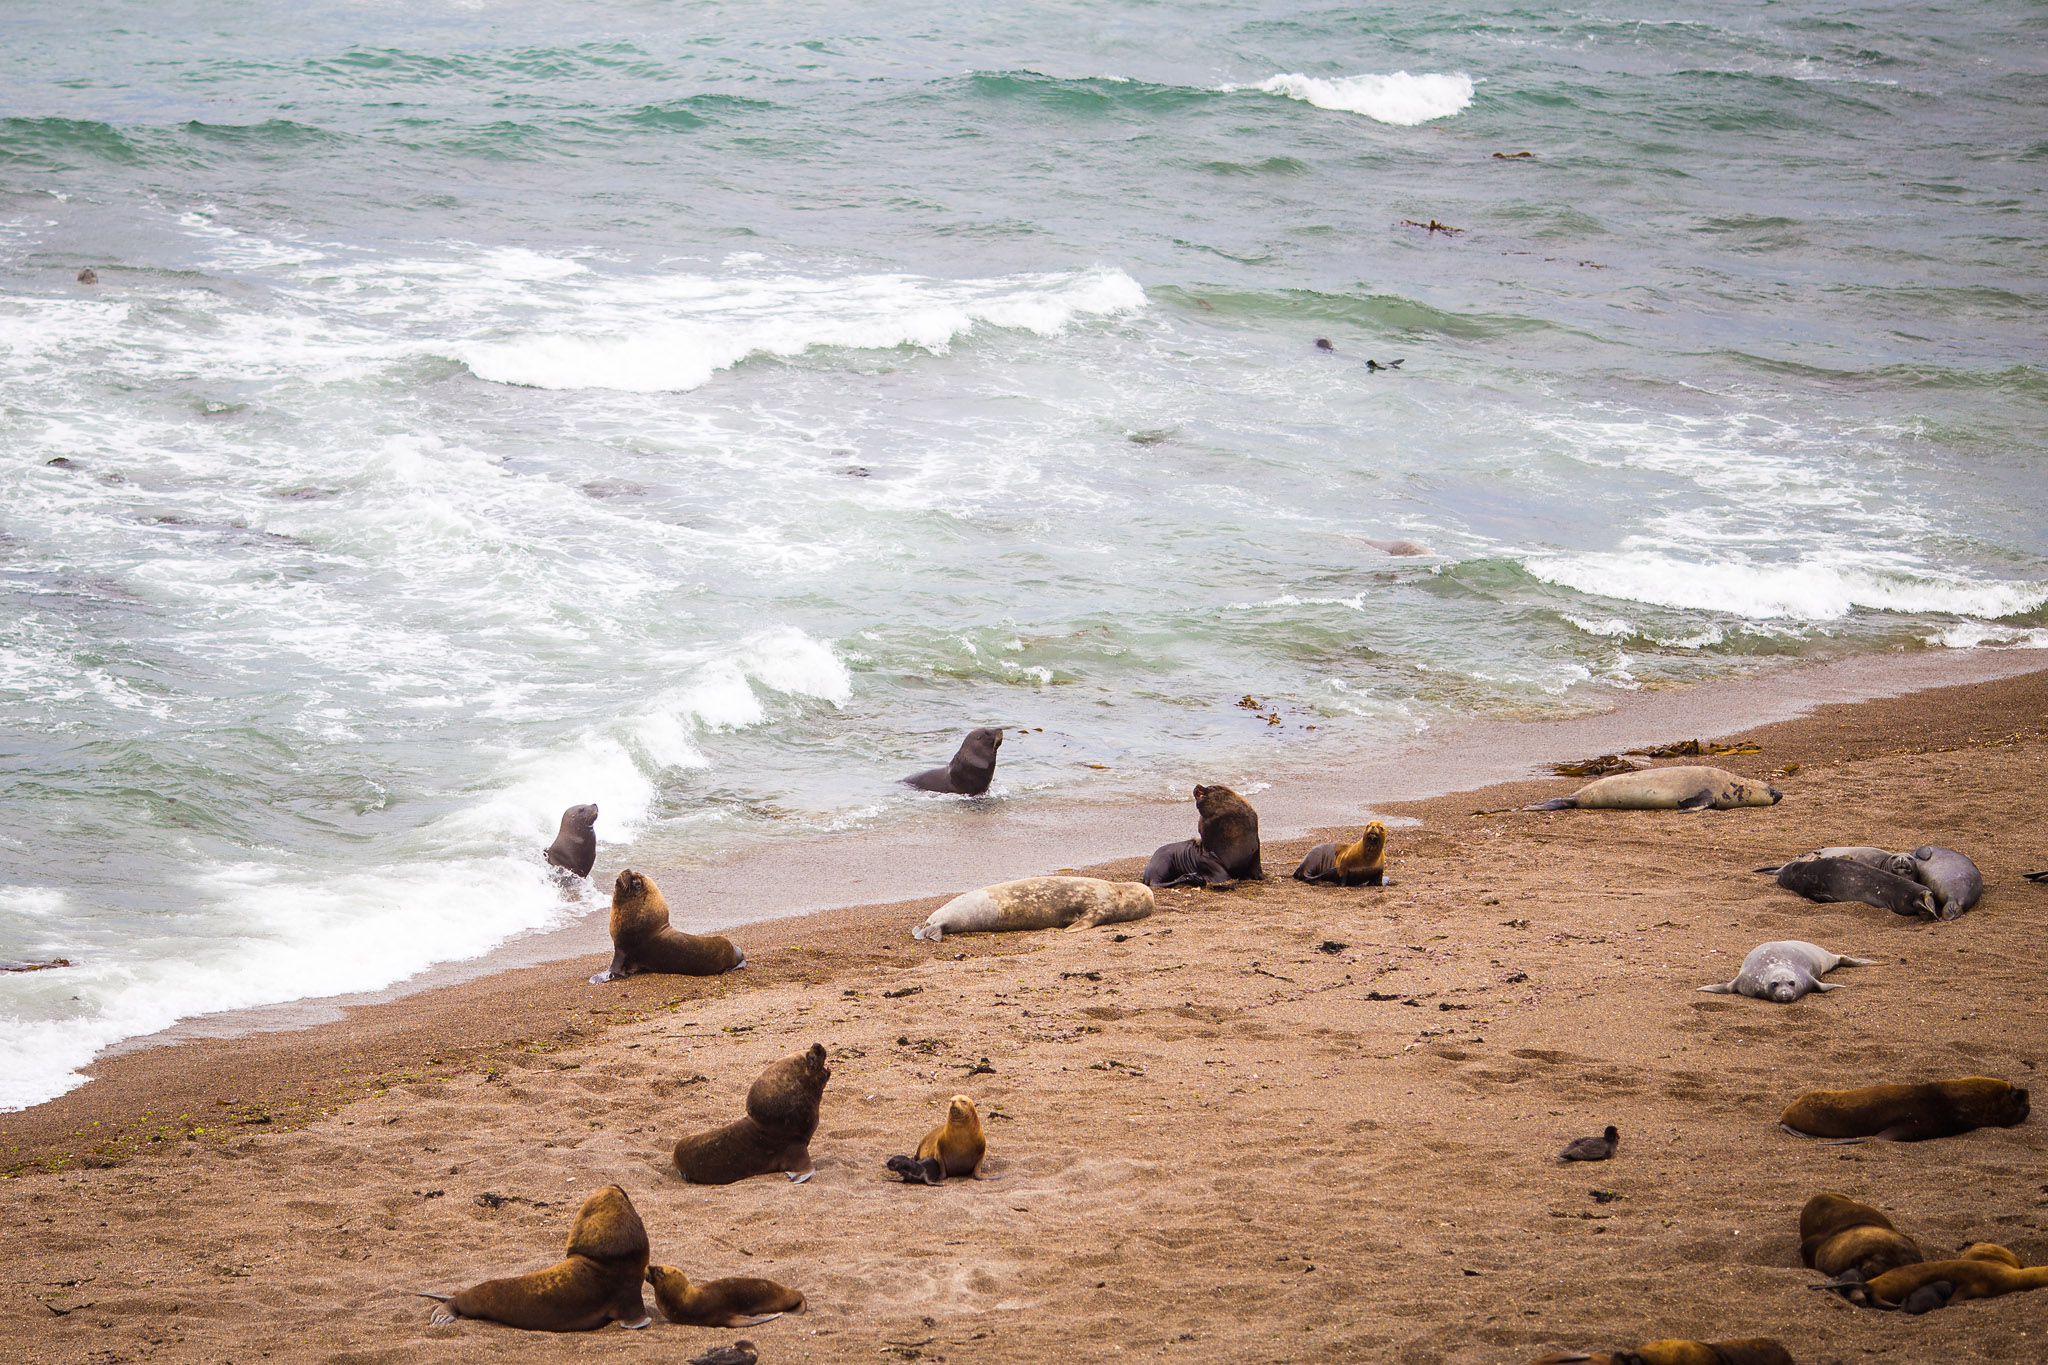 wedding-travellers-argentina-peninsula-valdes-sea-lion-beach